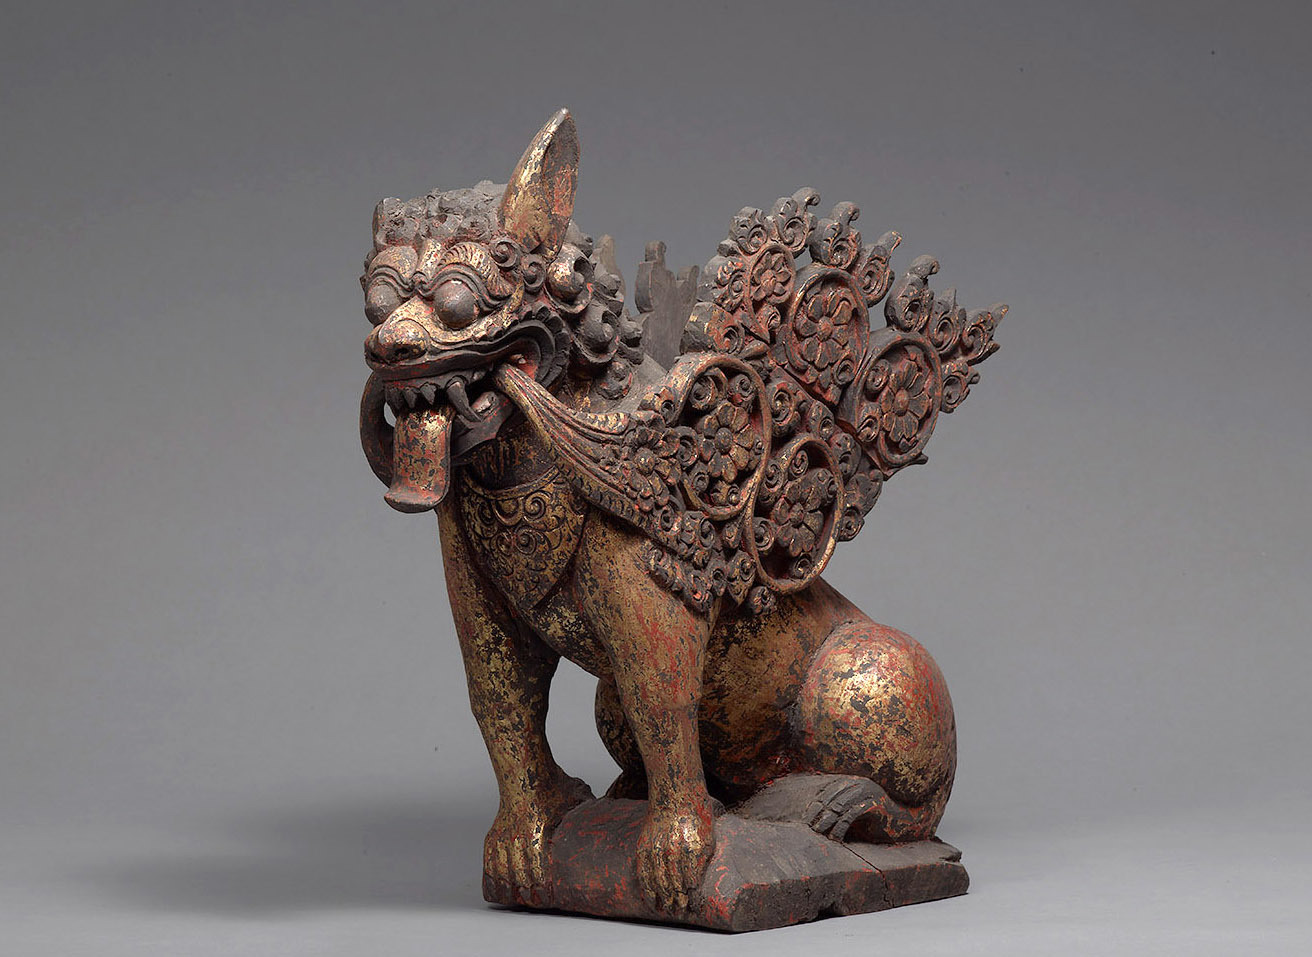 Balinese Sculpture |  Singa Ambara Raja  | 19th Century © KHM-Museumsverband